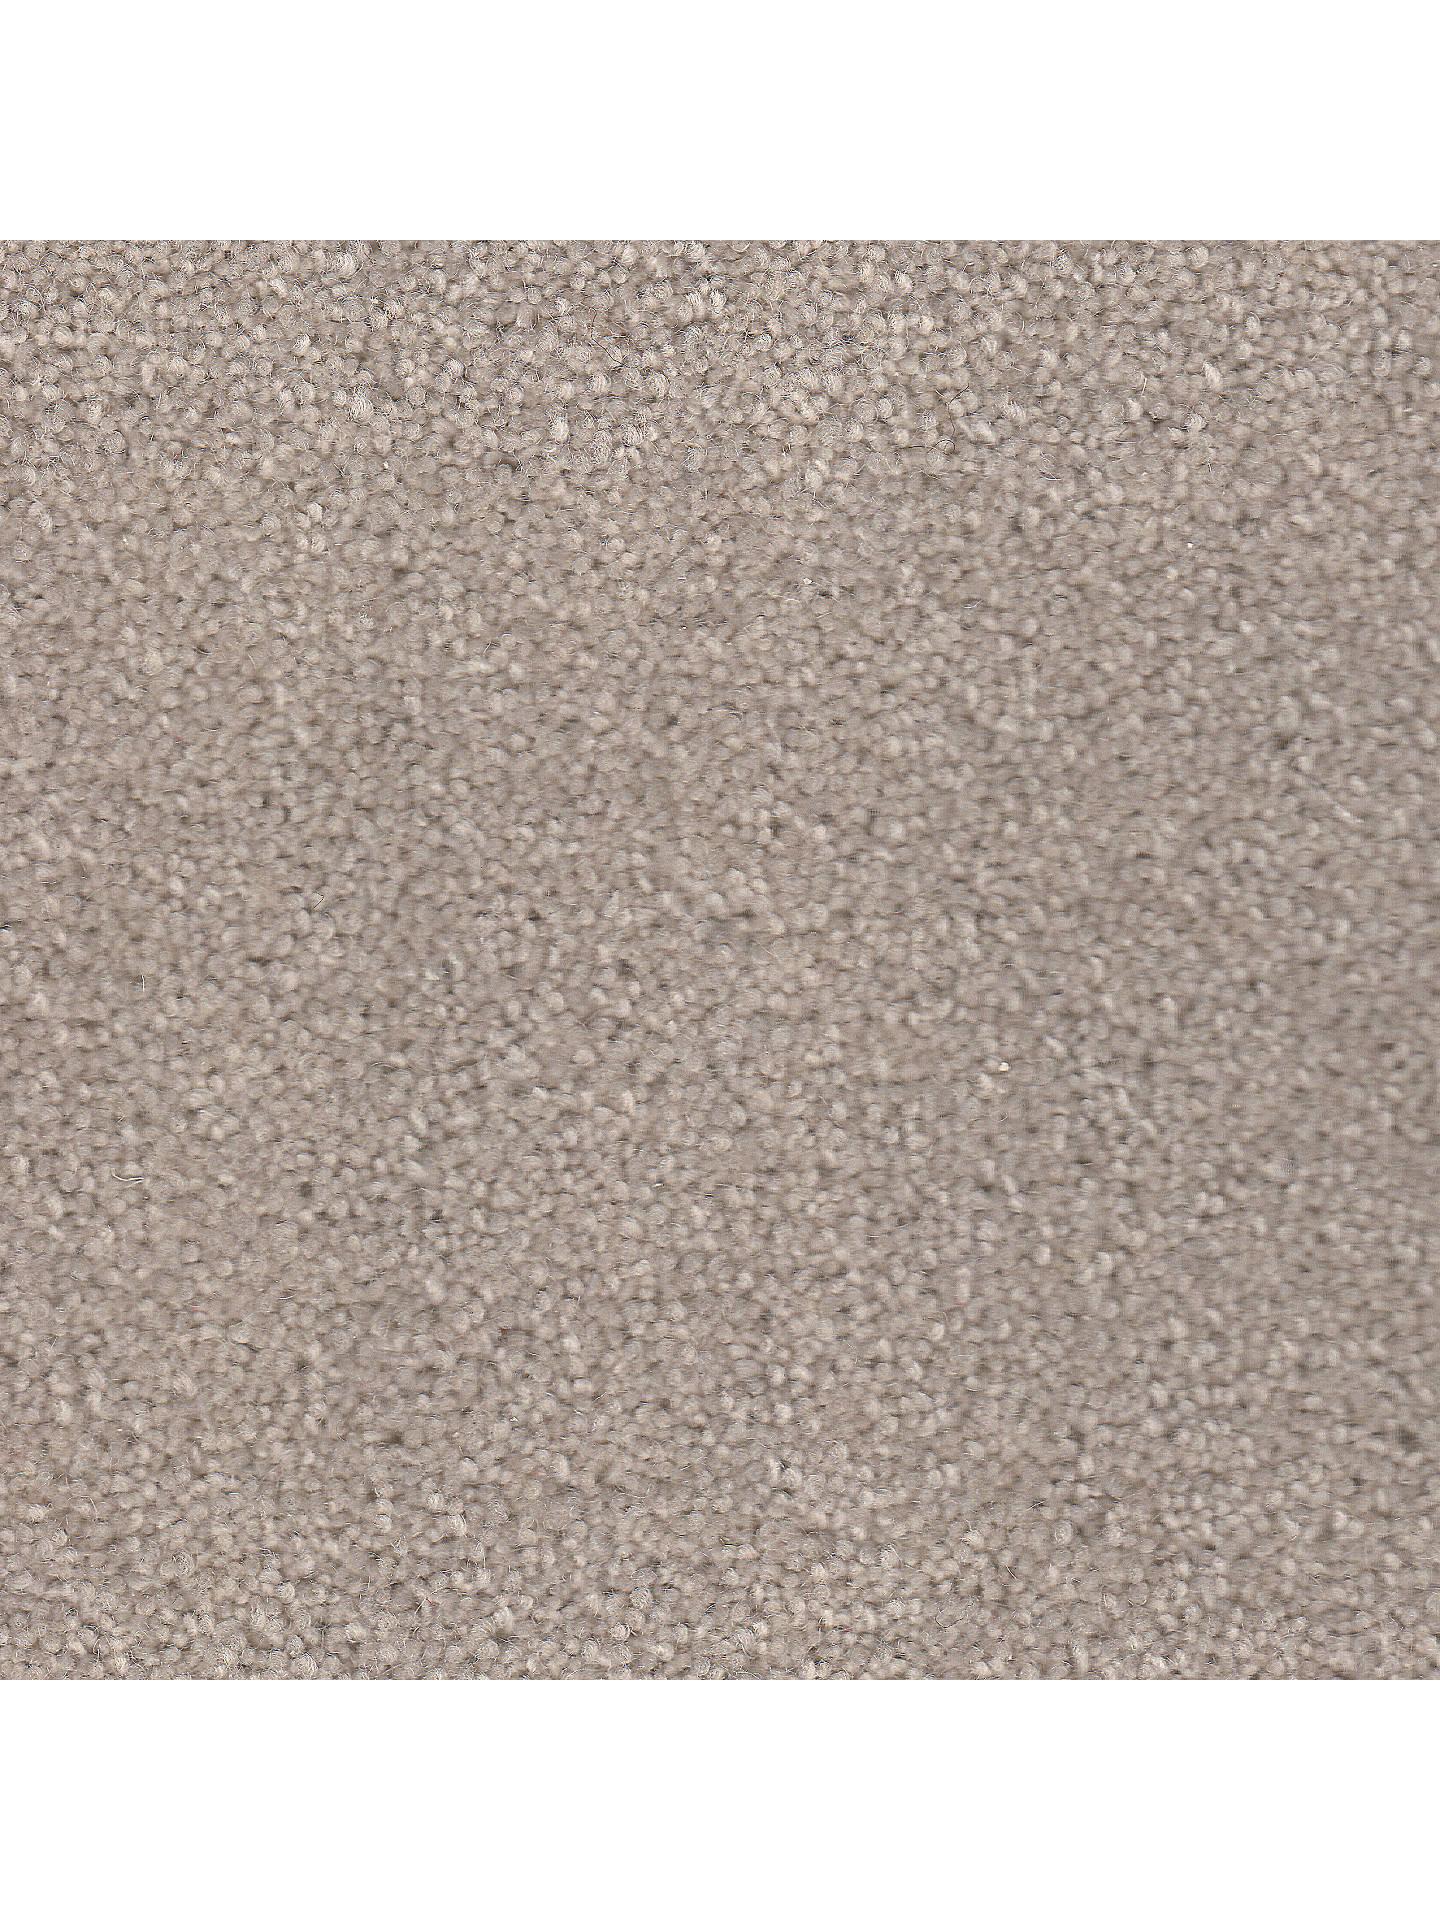 john lewis partners wool rich 42oz twist carpet at john. Black Bedroom Furniture Sets. Home Design Ideas